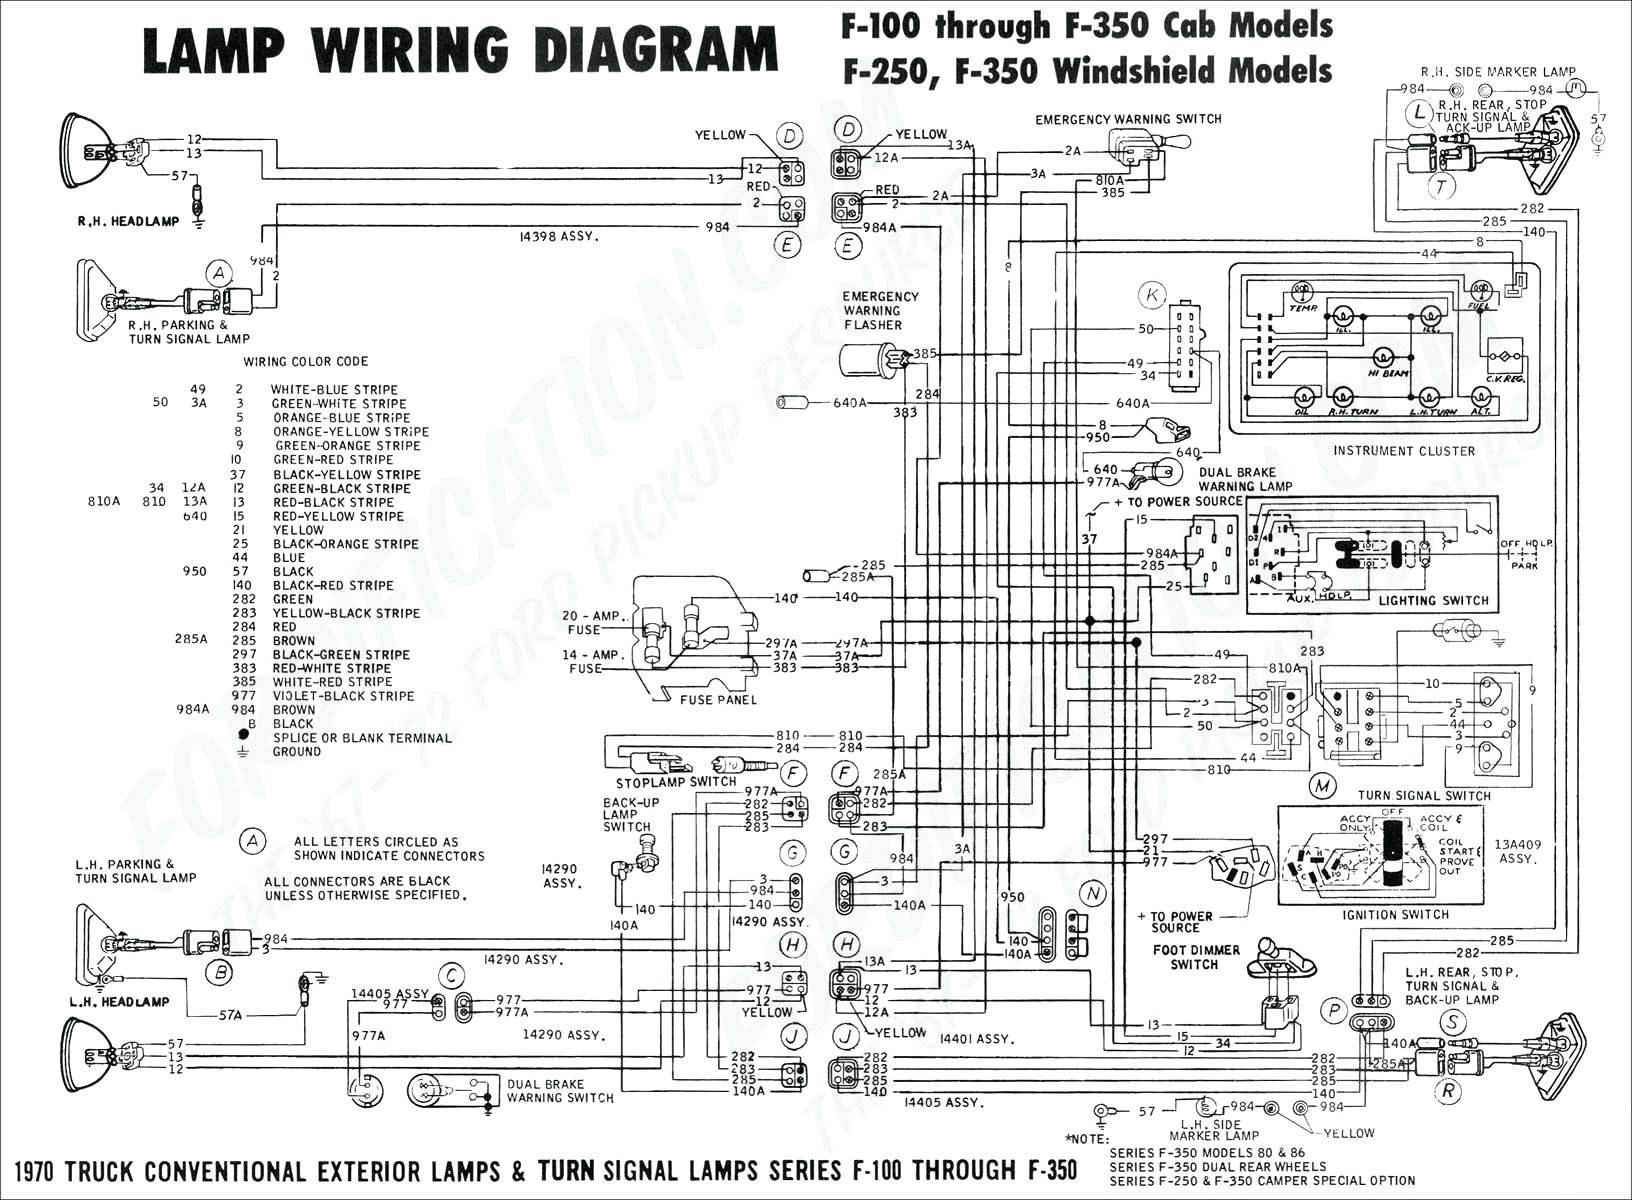 1999 Buick Century Wiring Diagram 2003 Buick Lesabre Radio Wiring Diagram Book F53 Wiring Radio Of 1999 Buick Century Wiring Diagram Free Buick Wiring Diagrams Data Schematics Wiring Diagram •